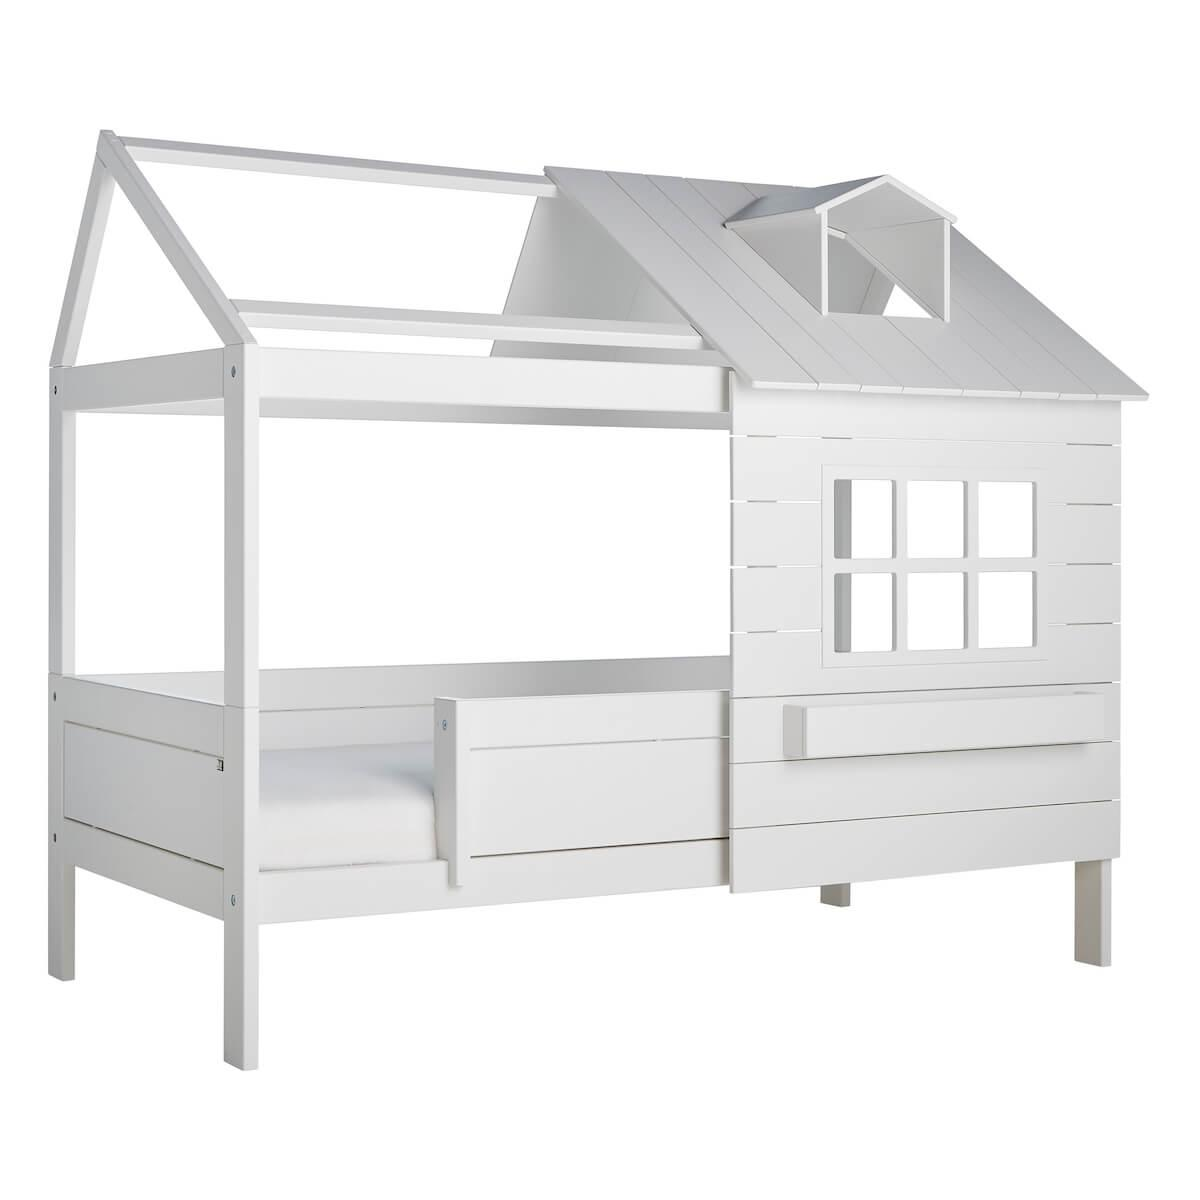 Hüttenbett 90x200cm LAKE HOUSE 1 Lifetime weiß